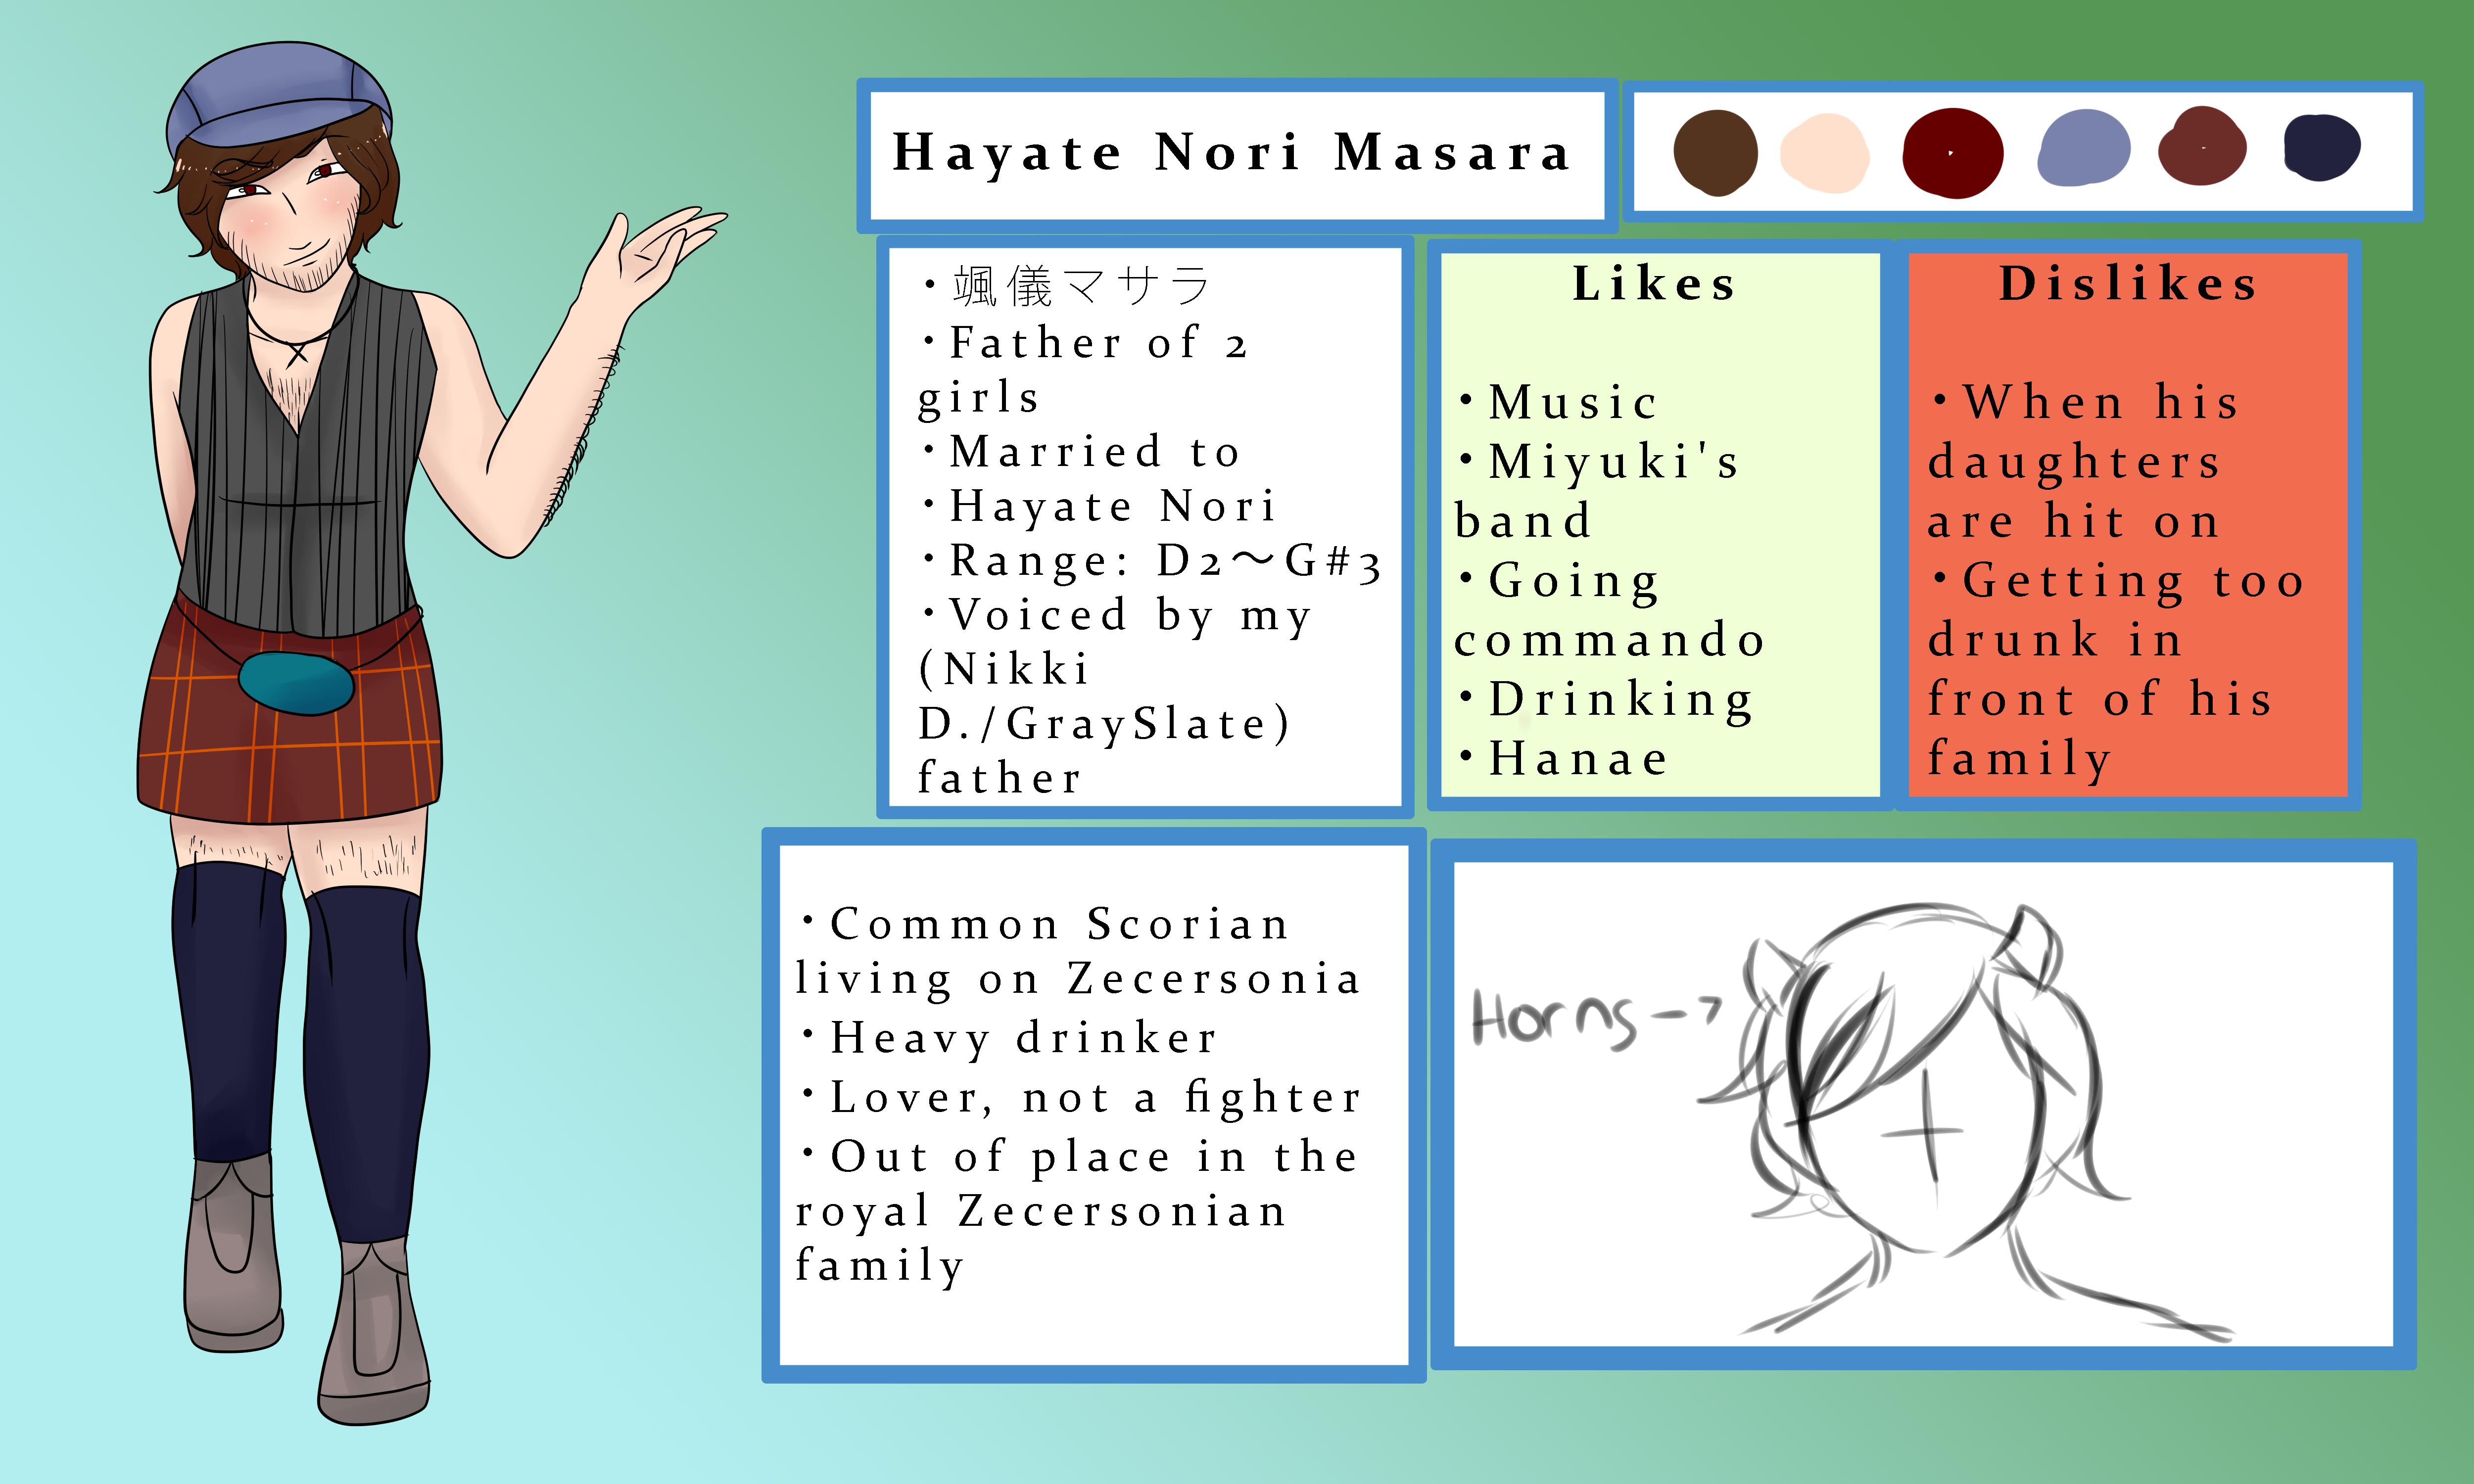 Hayate_Nori_Masara_Offcial_Reference.png